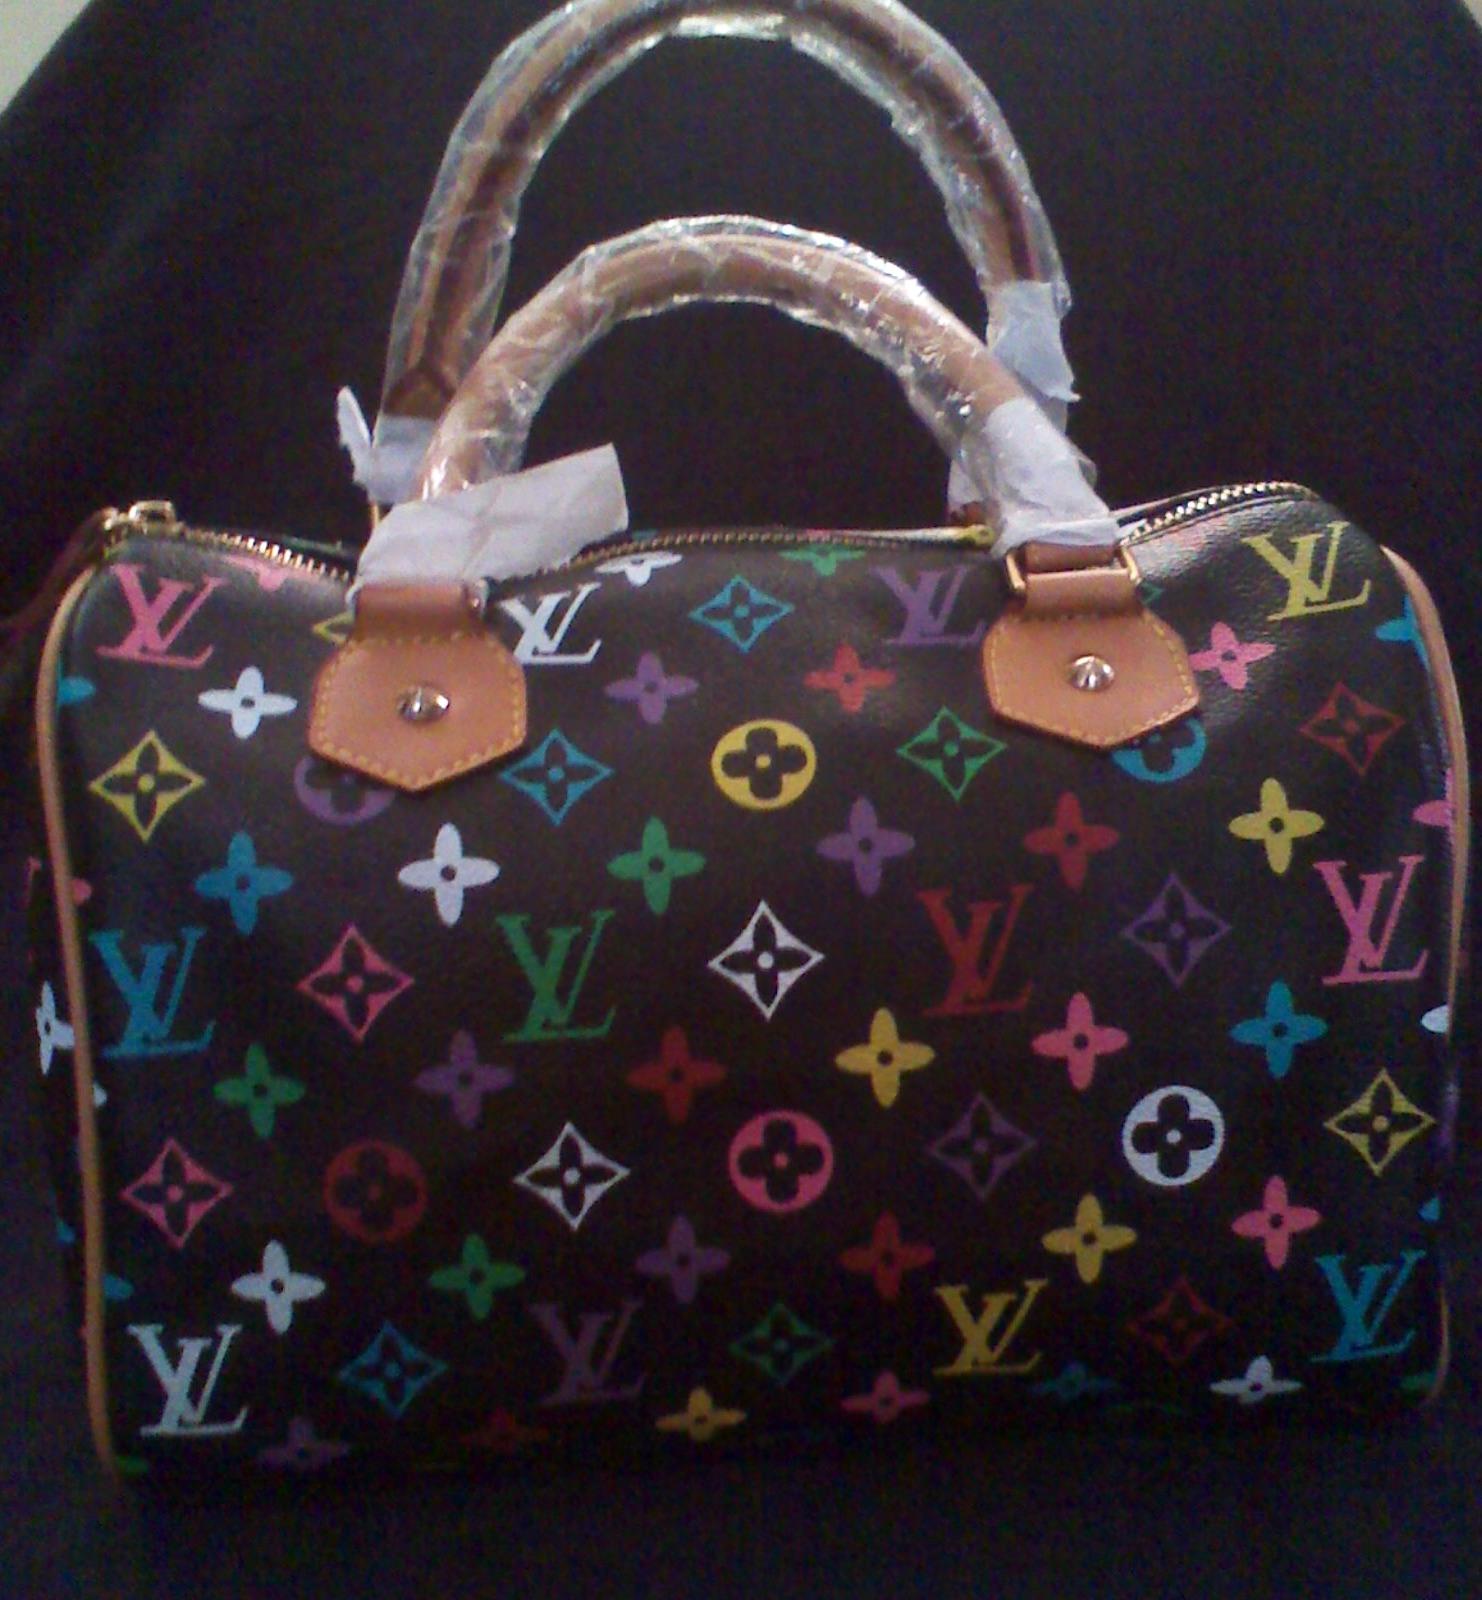 8d461b5990dd Brand  Louis Vuitton replica. Material  Coated Fabric